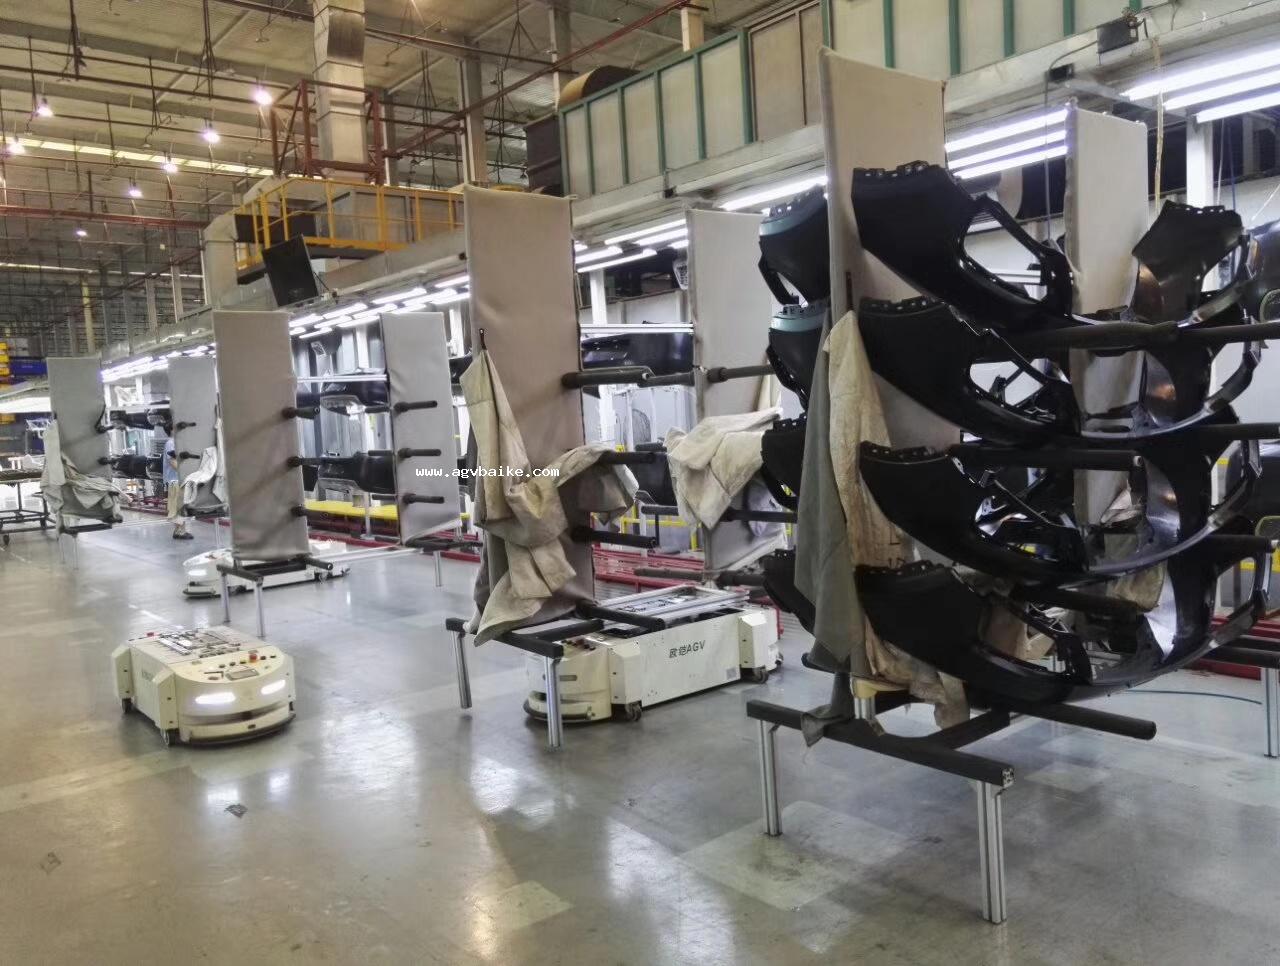 AGV物流搬运机器人 机遇与挑战并存